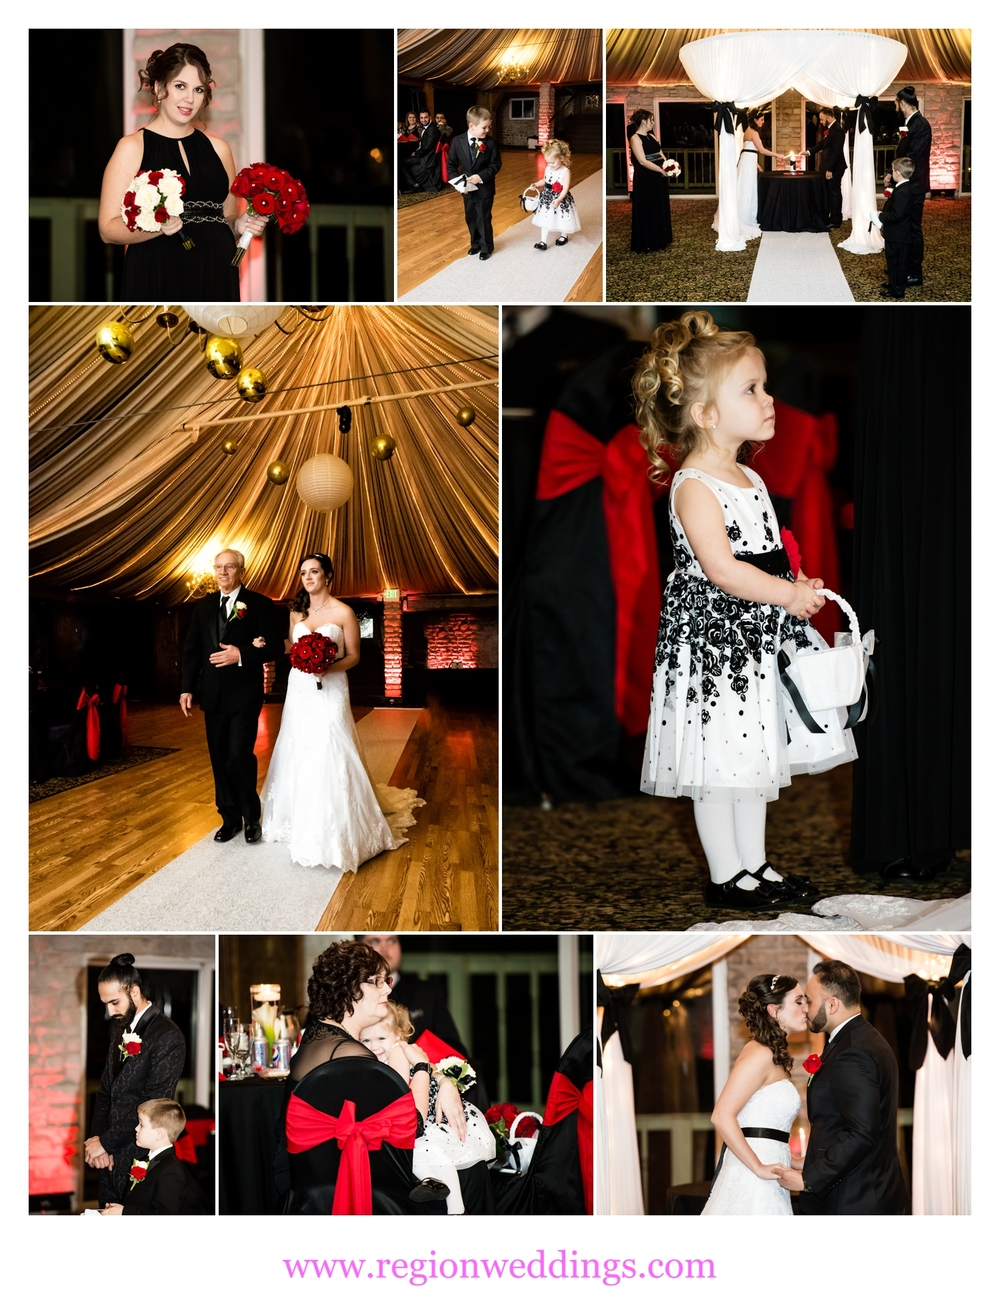 An indoor wedding ceremony at Meyer's Castle.